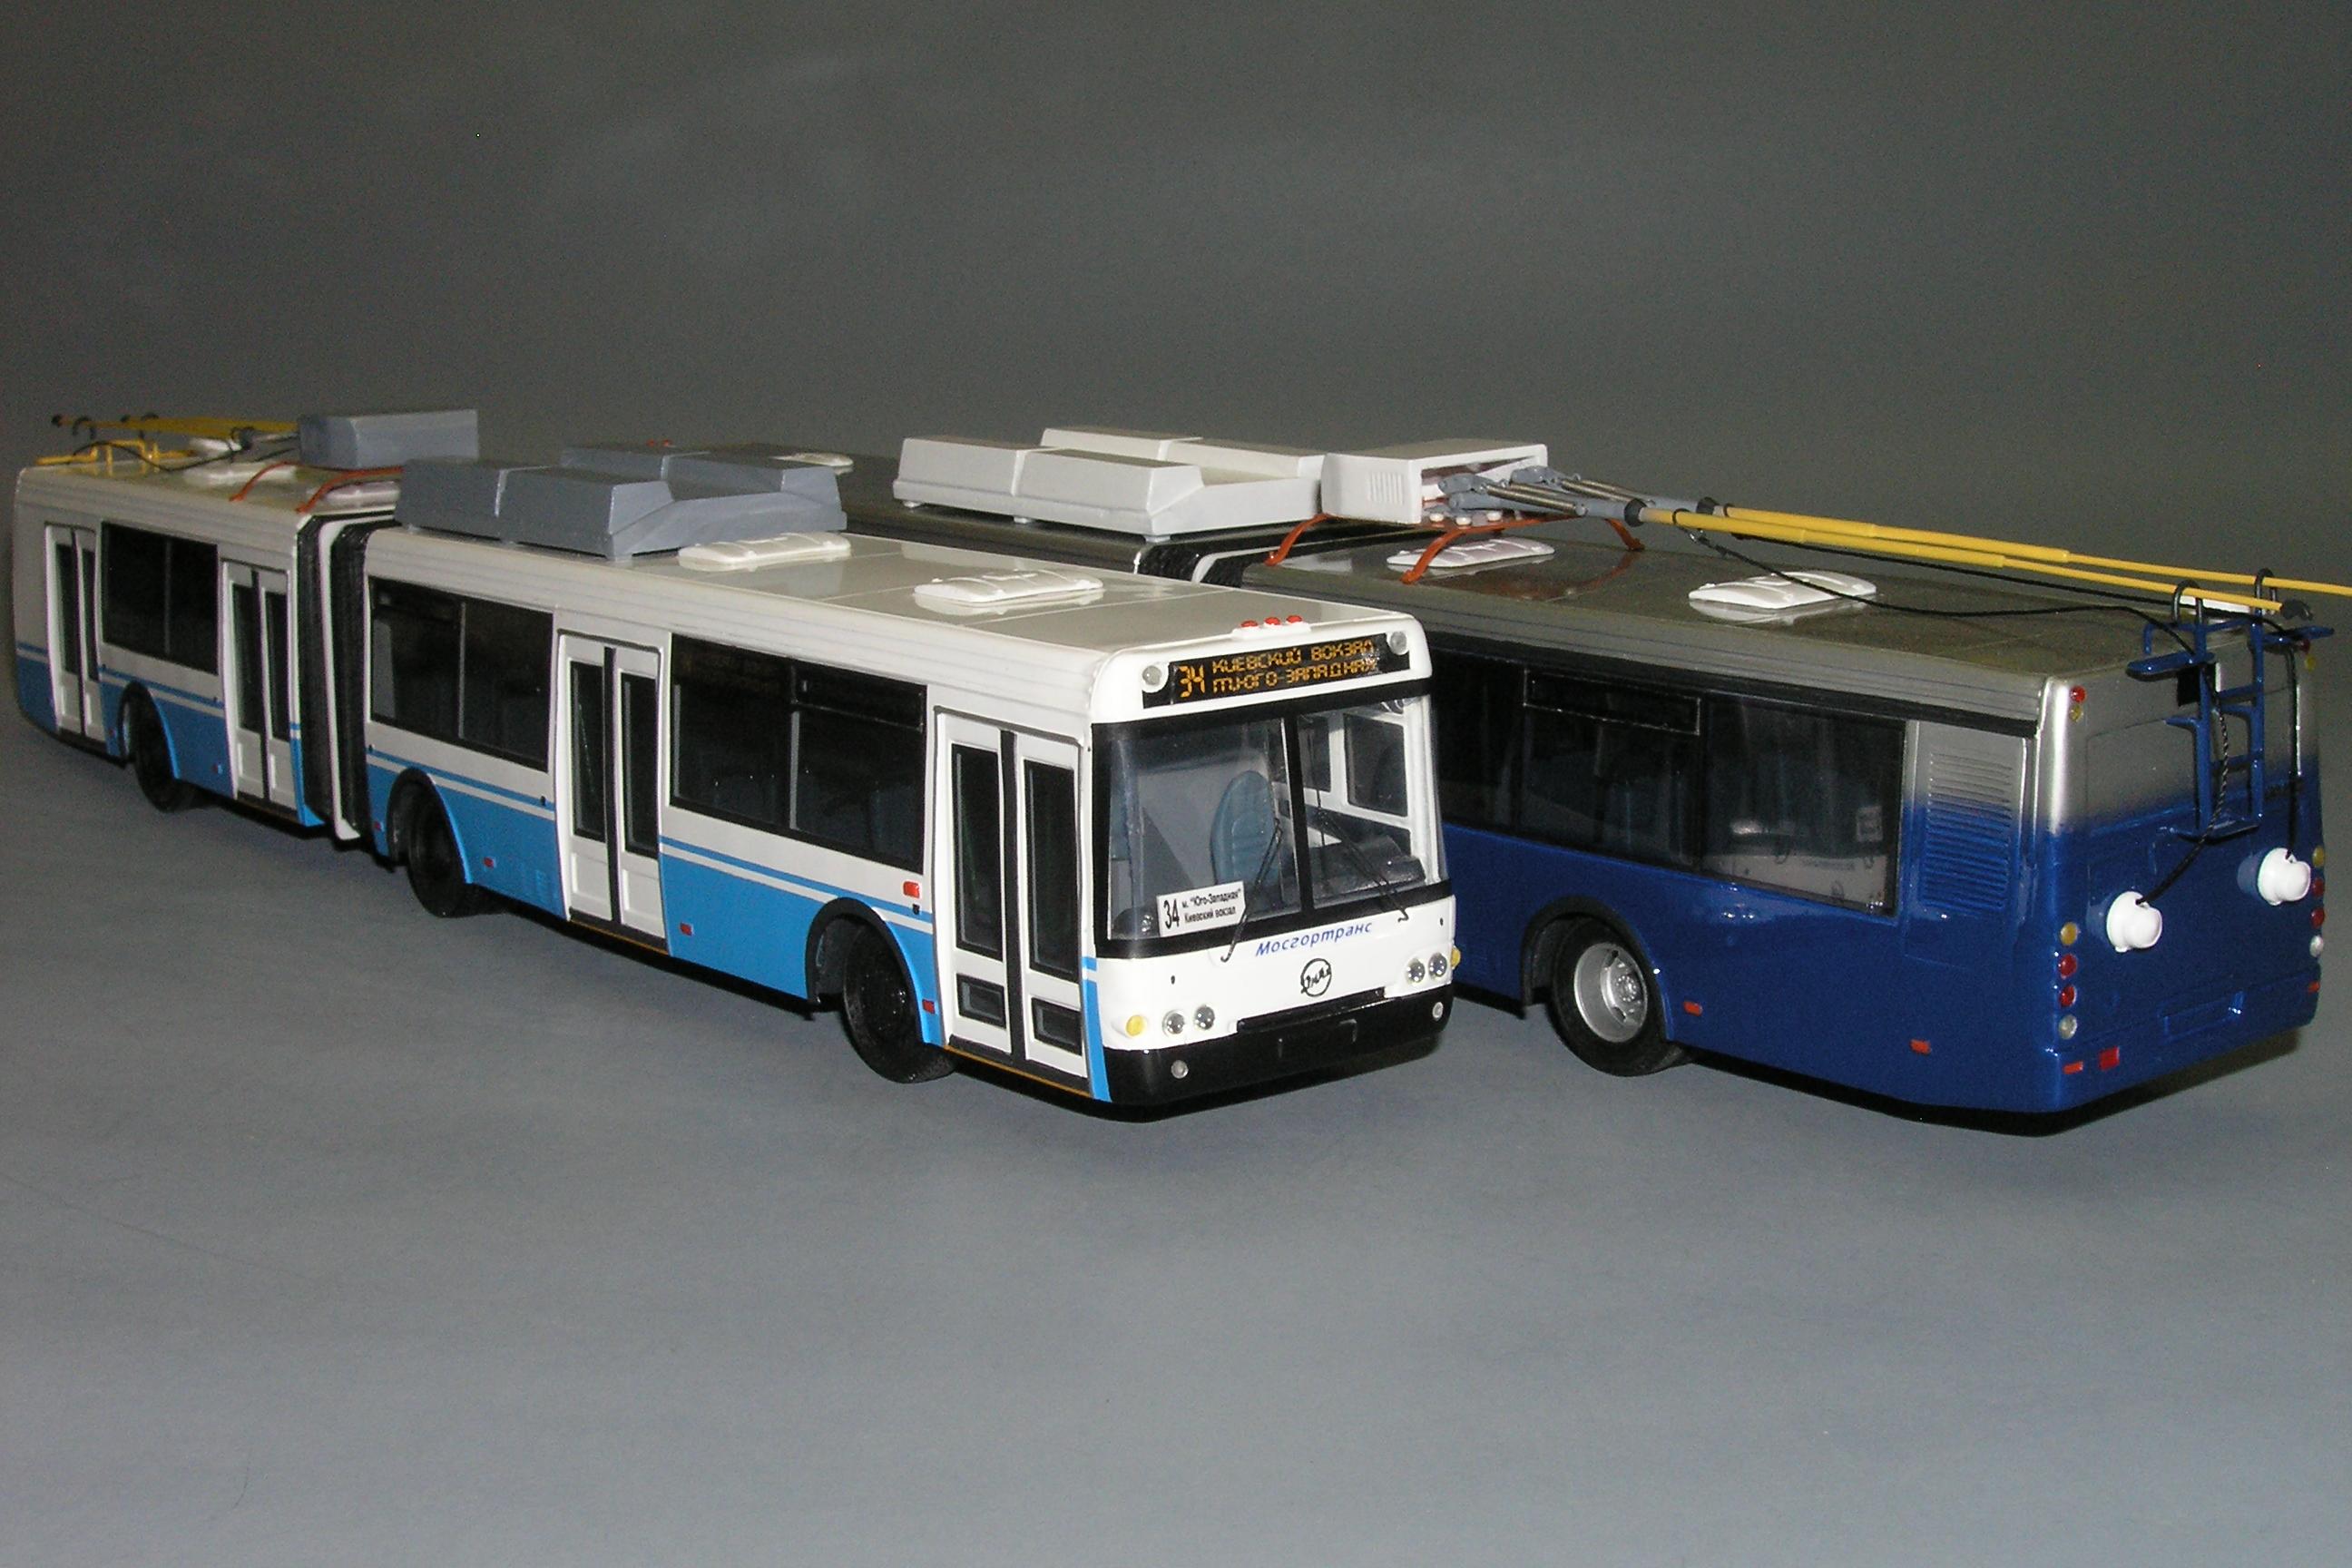 V1-72.1